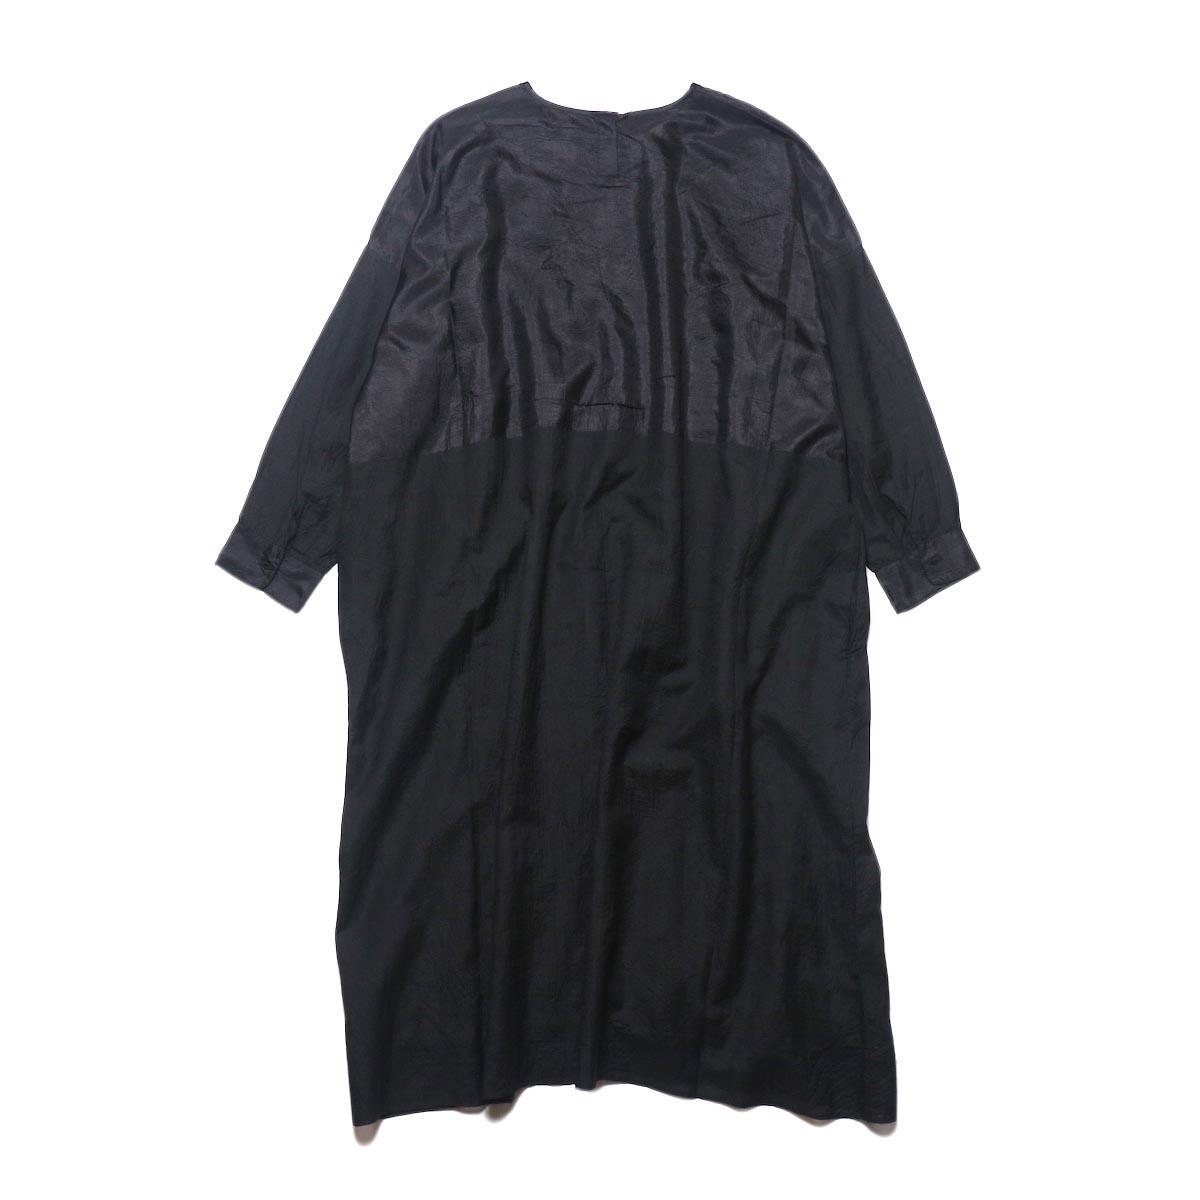 maison de soil / HAND WOVEN COTTON SILK × SILK PLAIN DROP SHOULDER DRESS (black) 背面